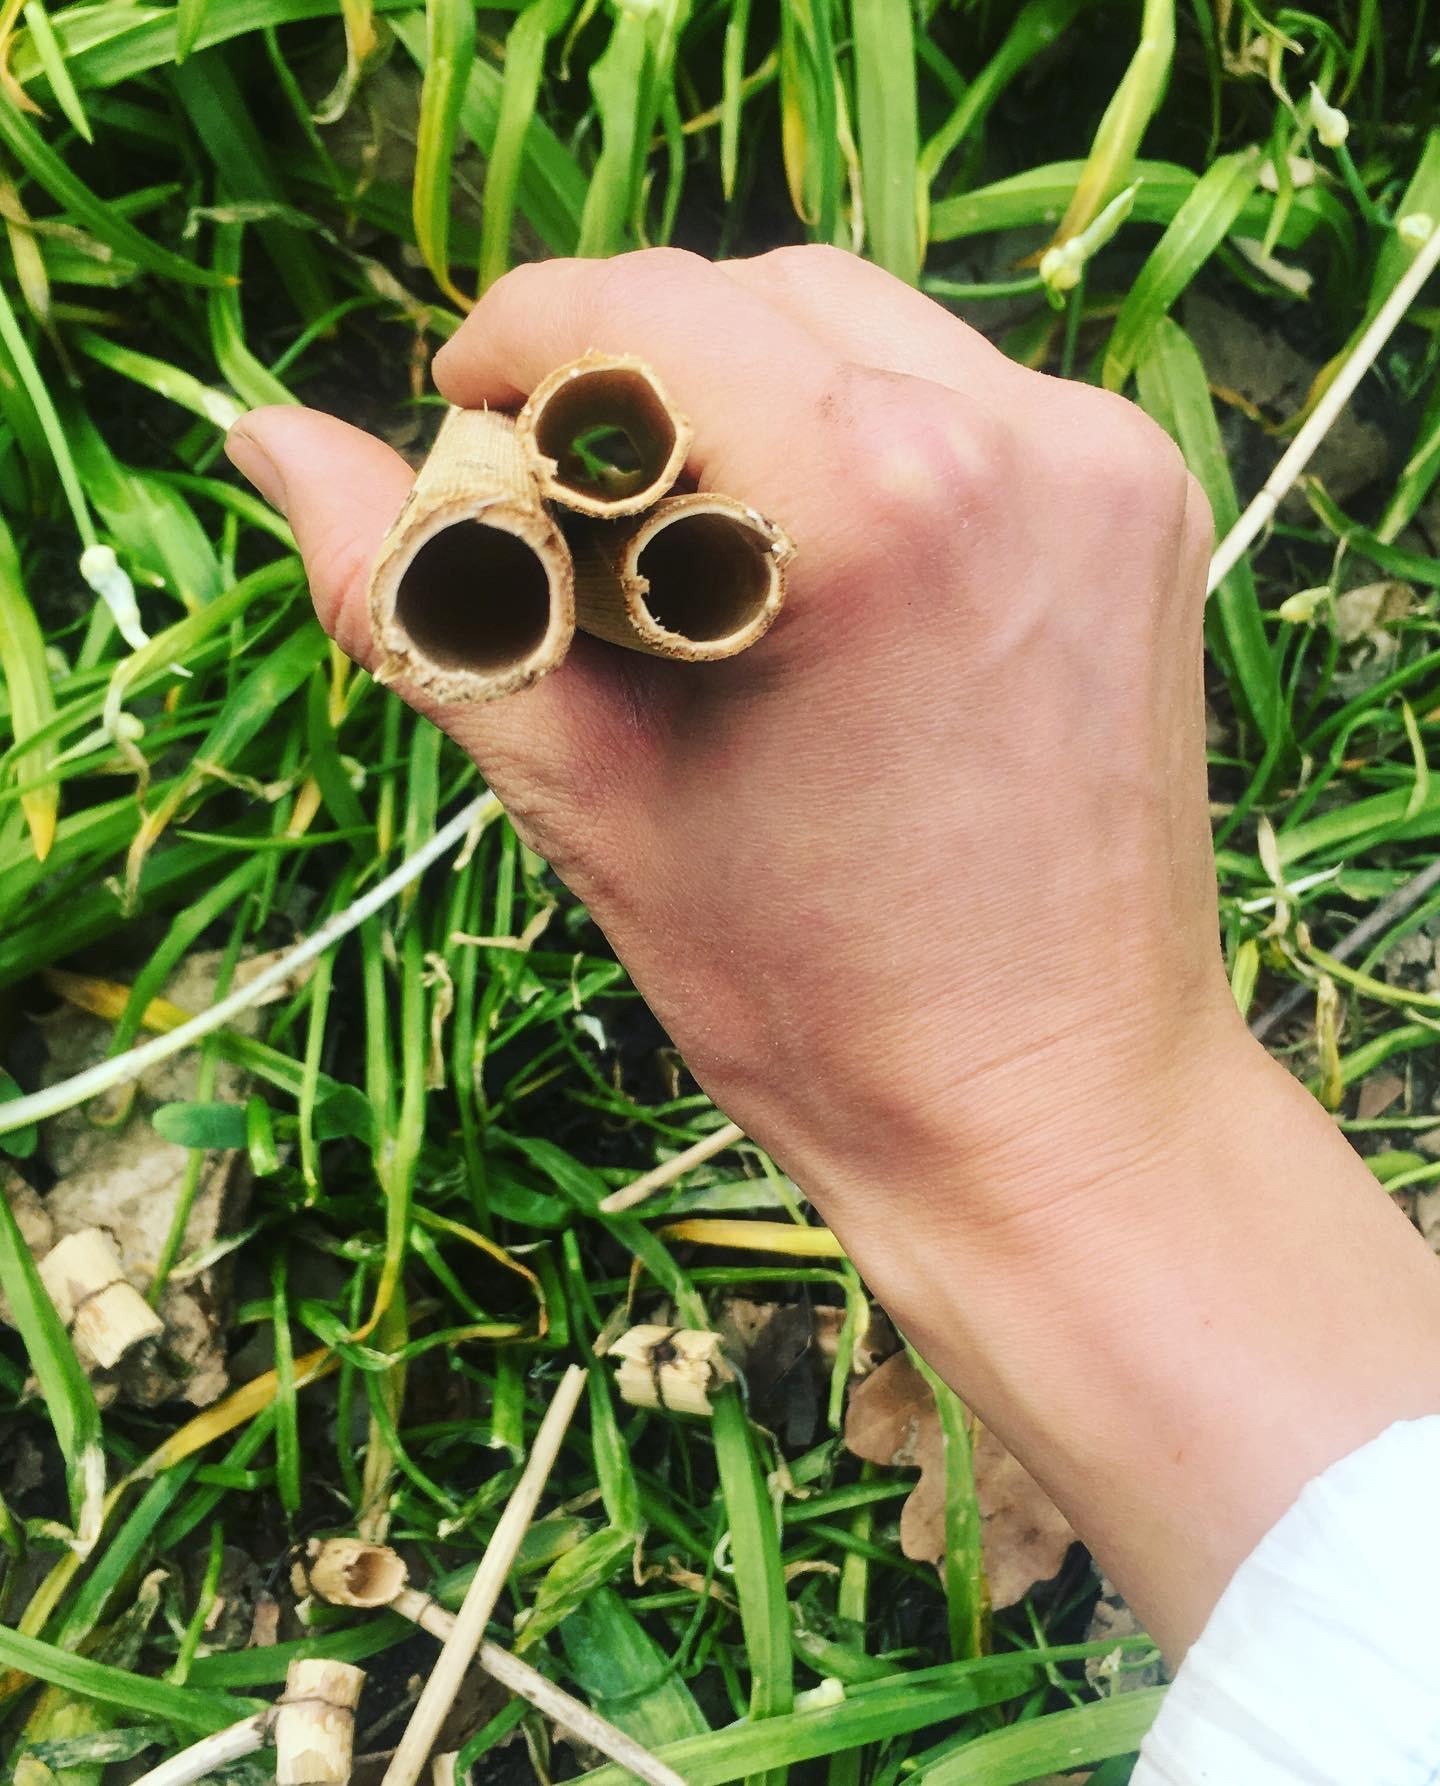 japanese knotweed straws